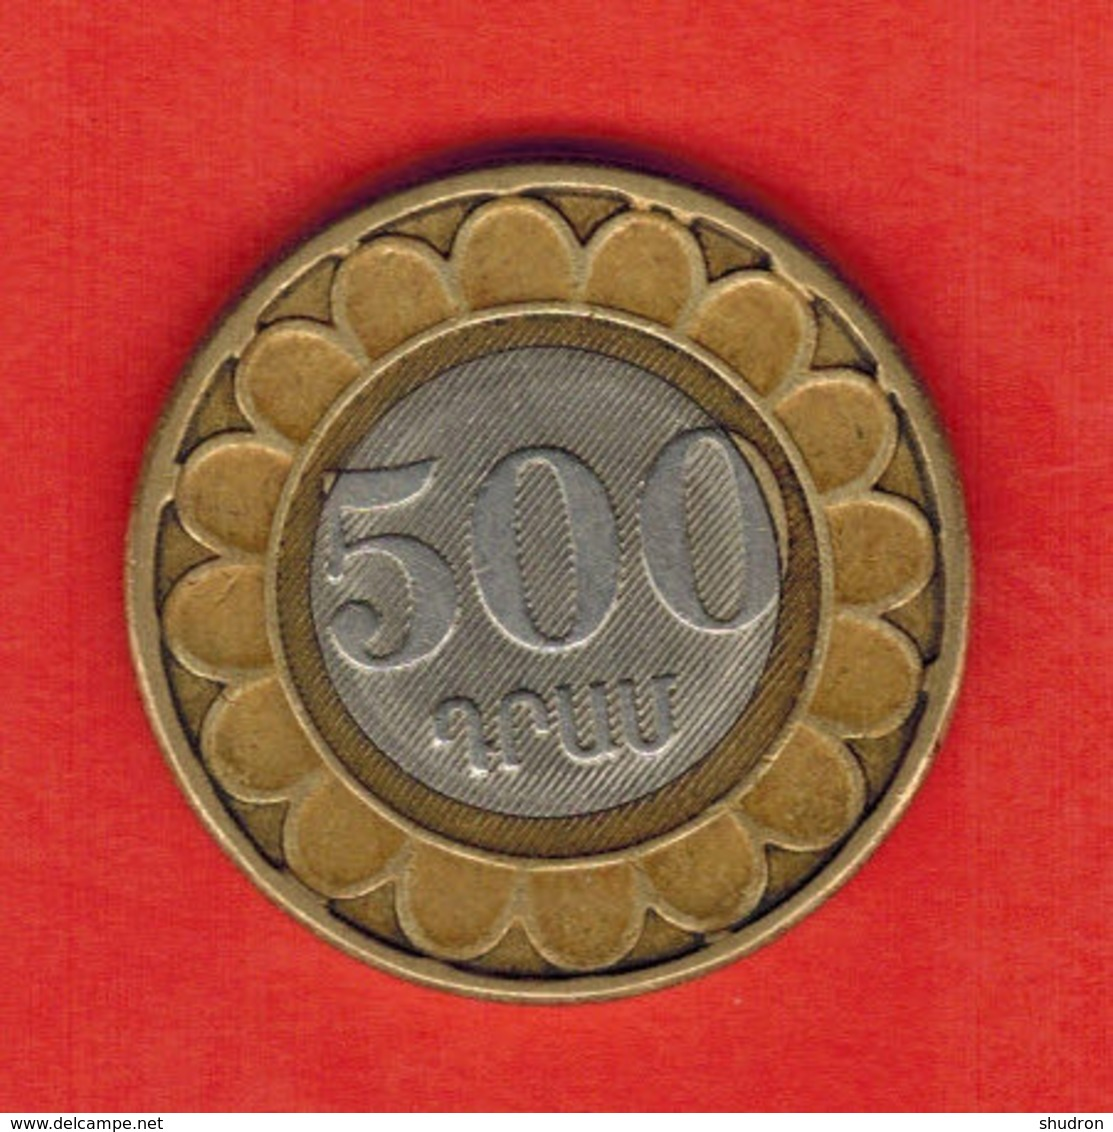 Armenia 500 Dram, 2003 - Armenia